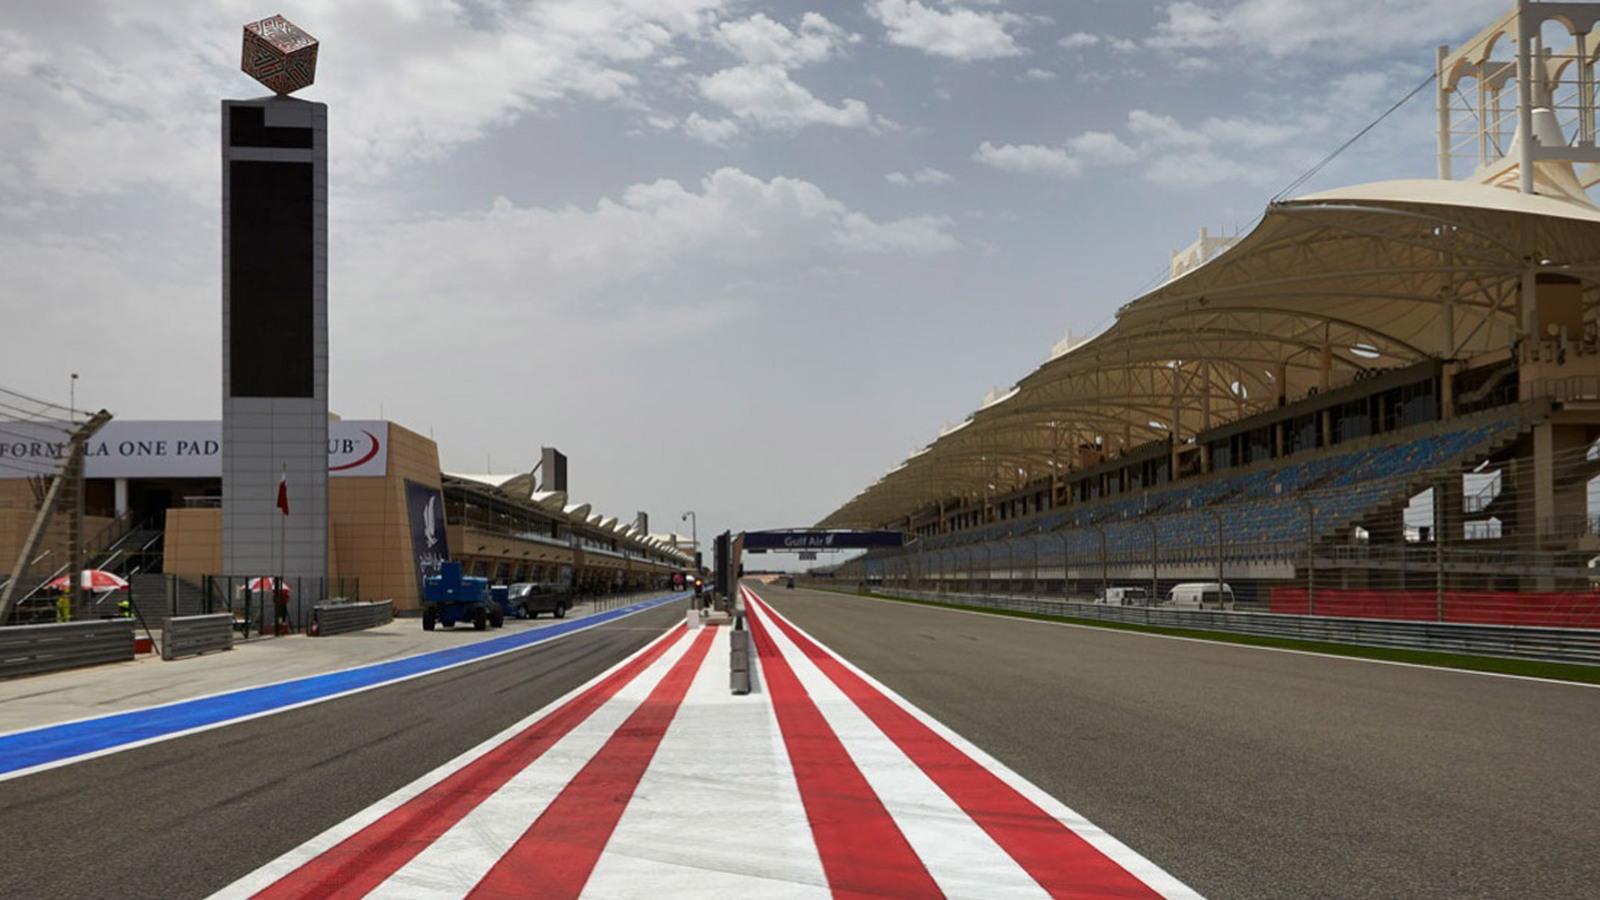 Bahrain International Circuit, home of the Formula 1 Bahrain Grand Prix